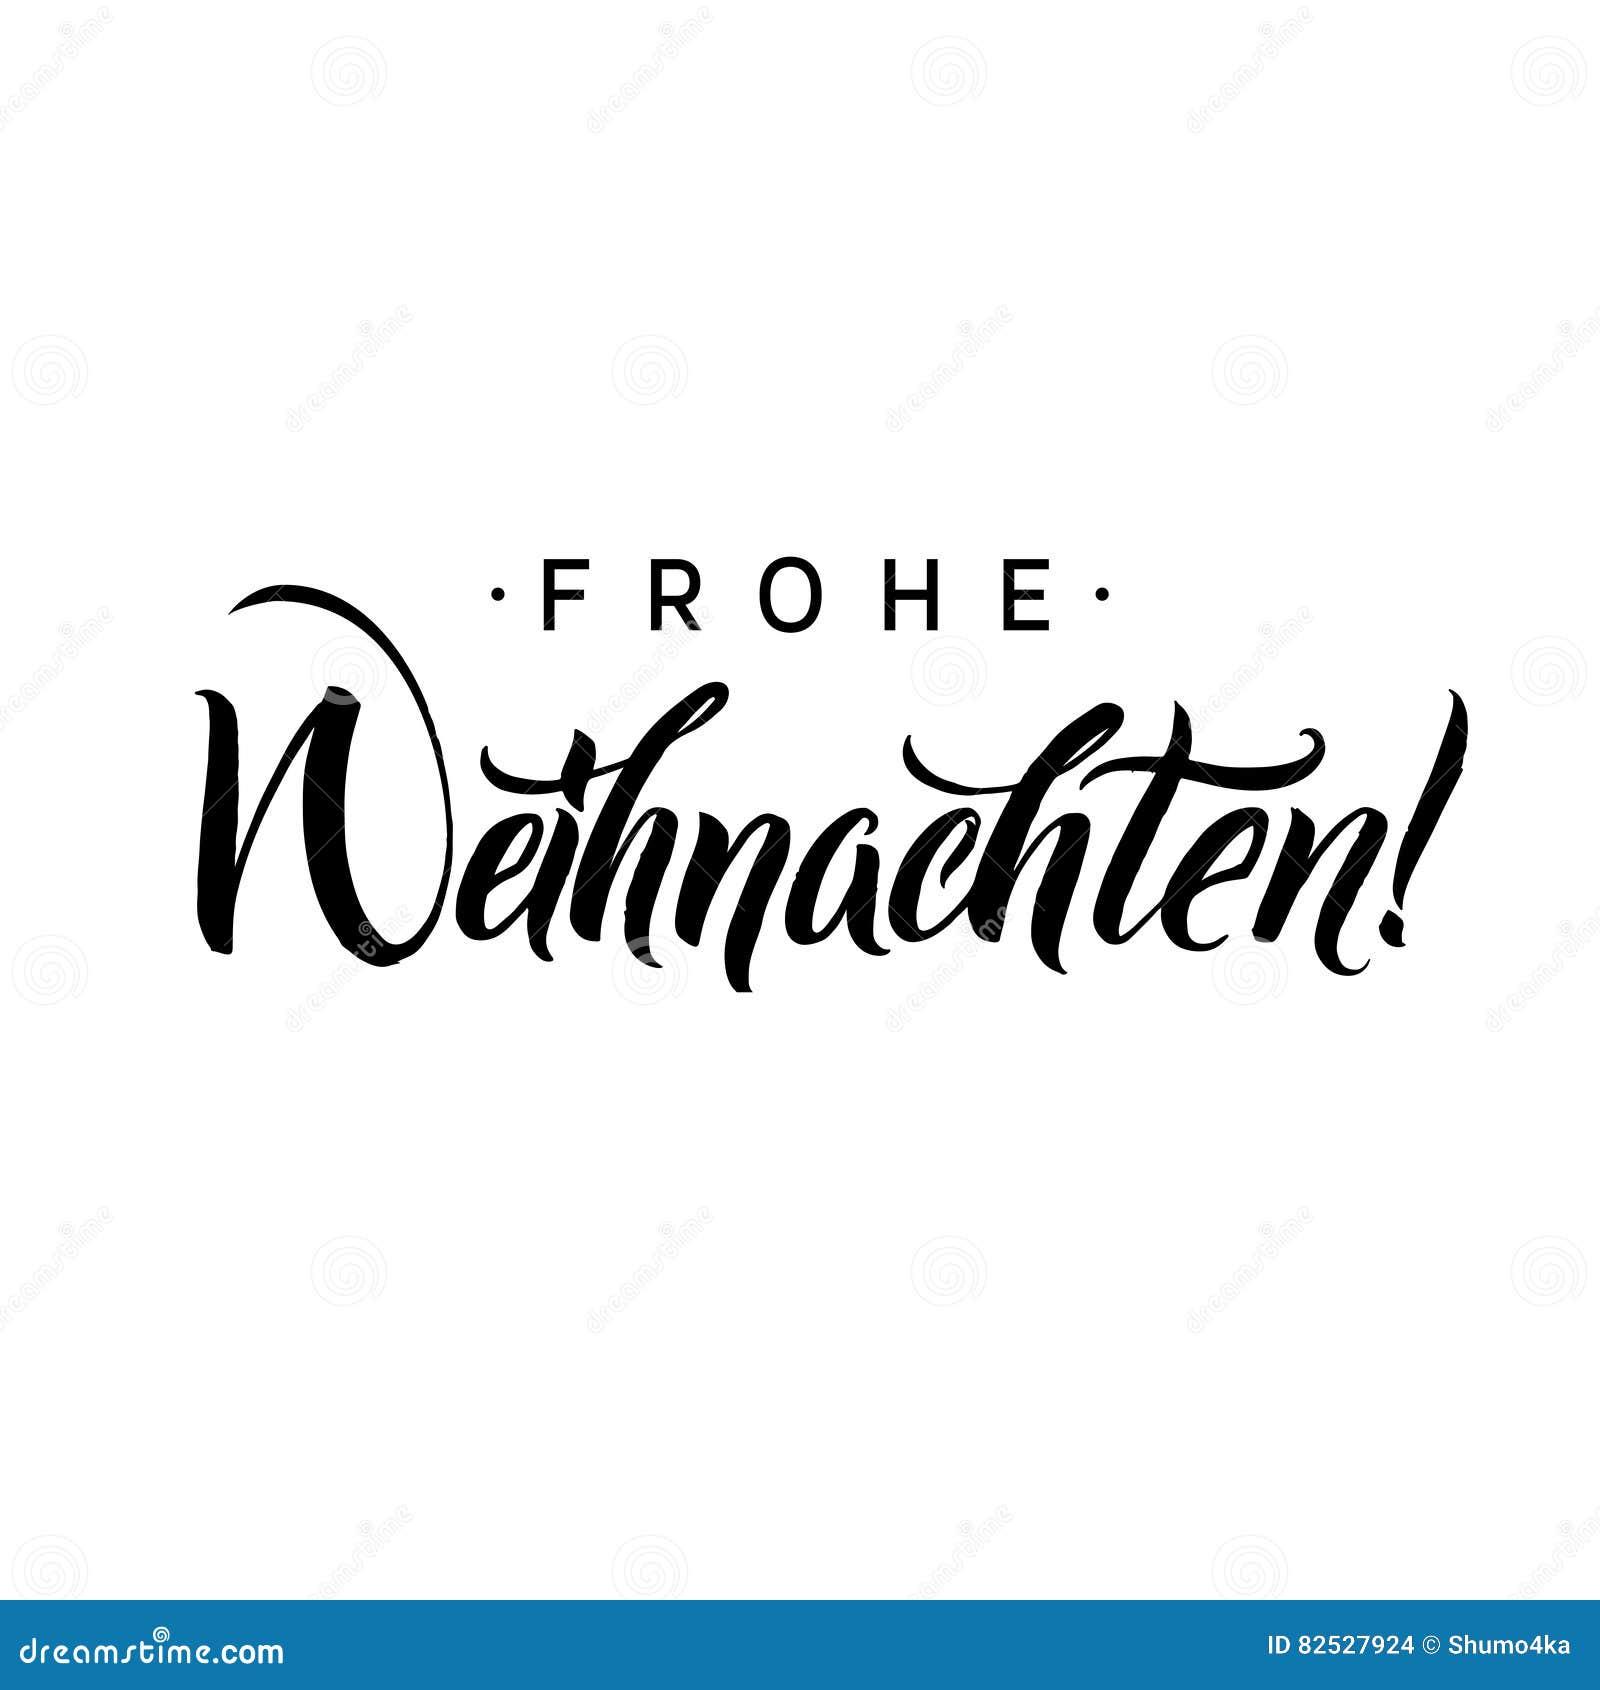 frohe weihnachten calligraphie de joyeux no l en allemand. Black Bedroom Furniture Sets. Home Design Ideas